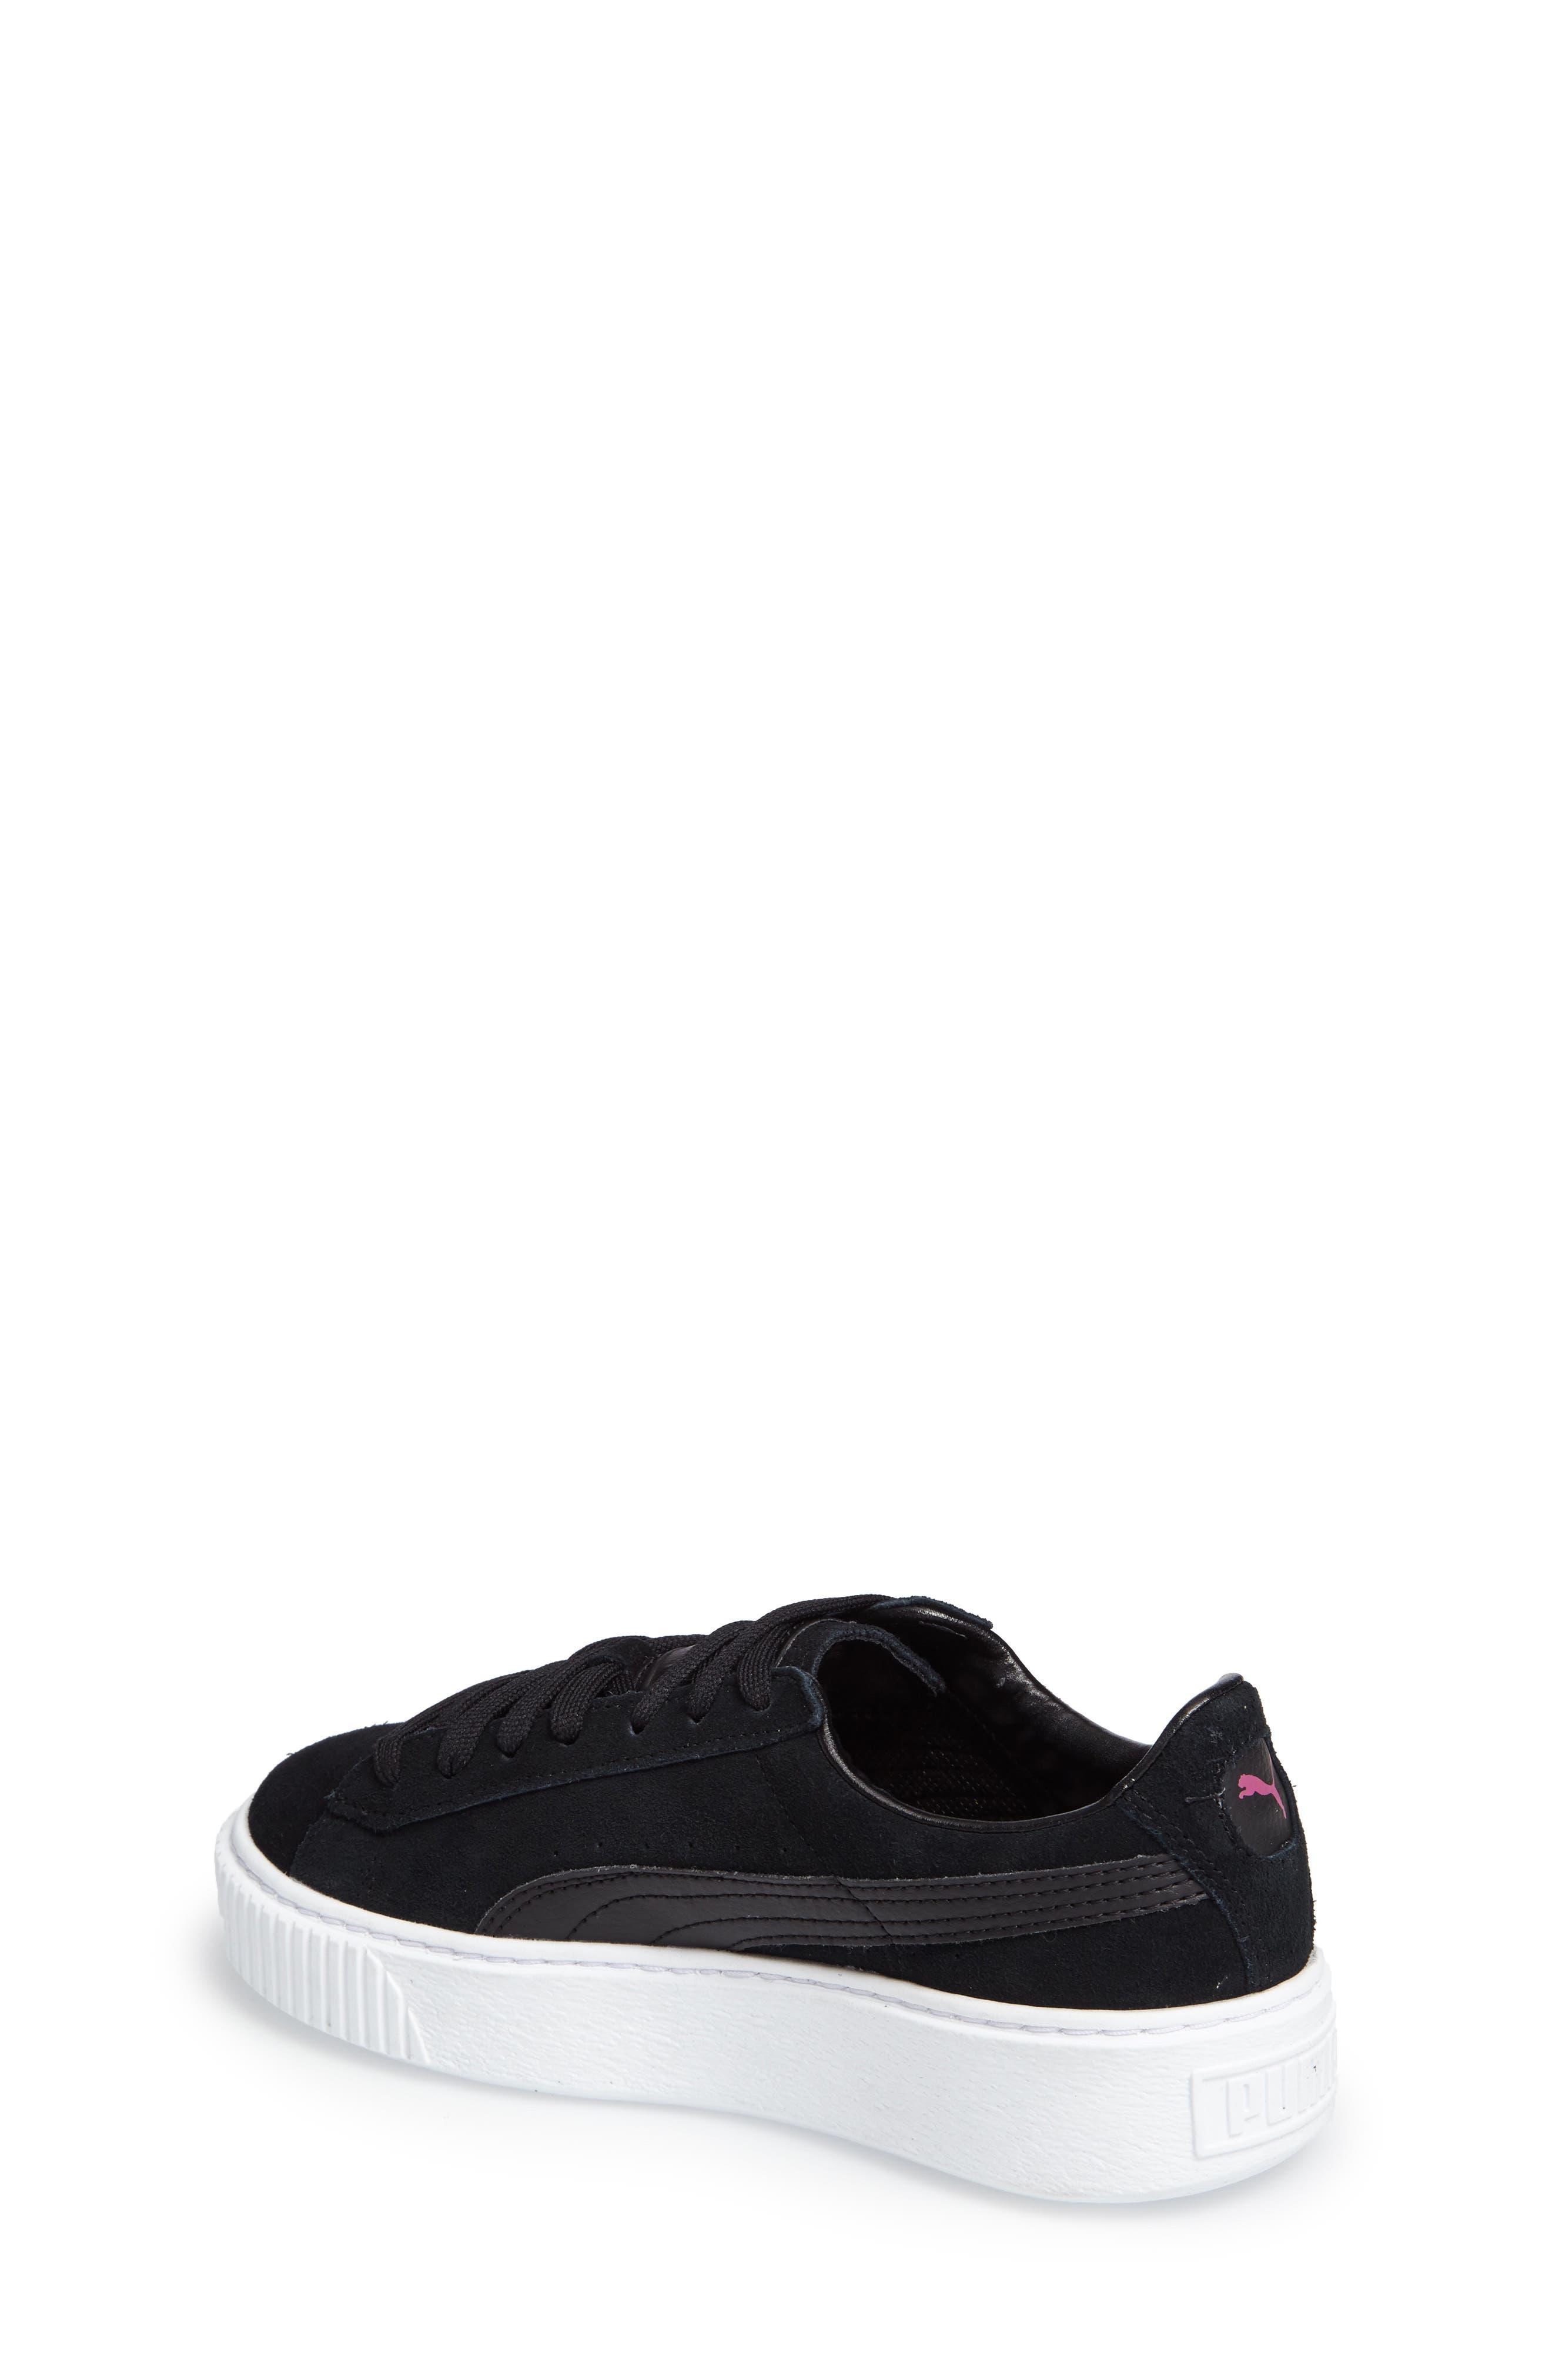 Platform Sneaker,                             Alternate thumbnail 2, color,                             001